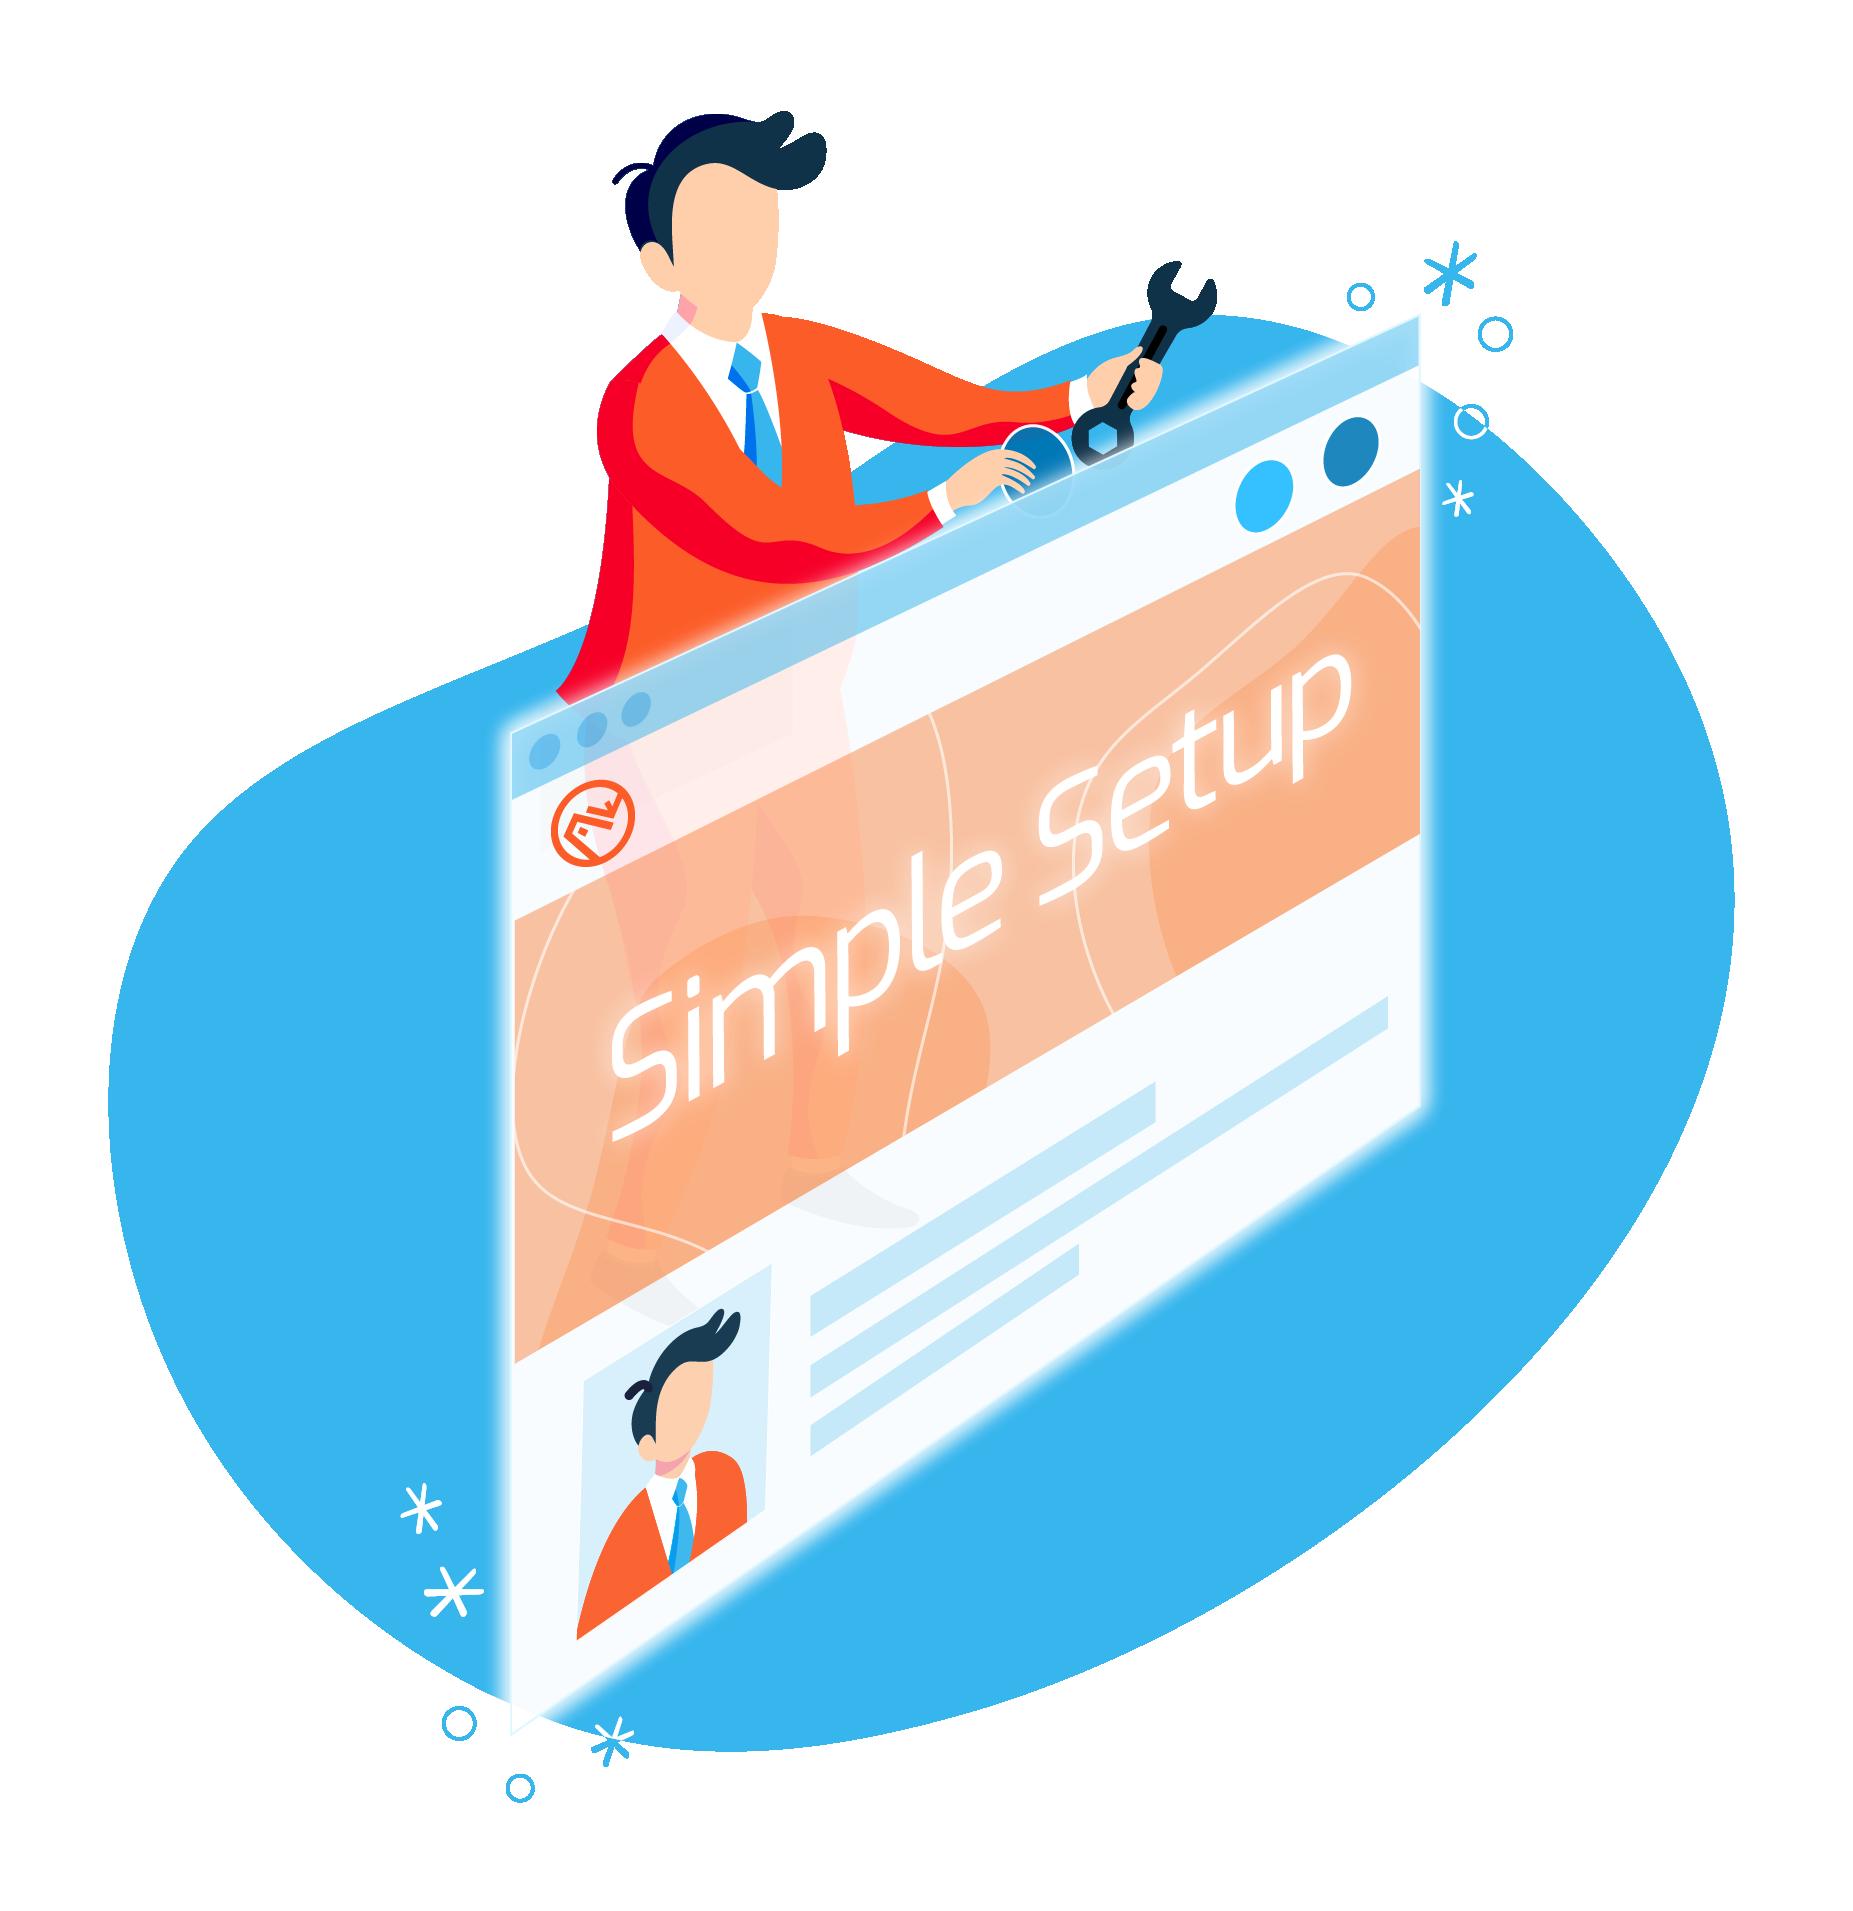 simple-setup-text